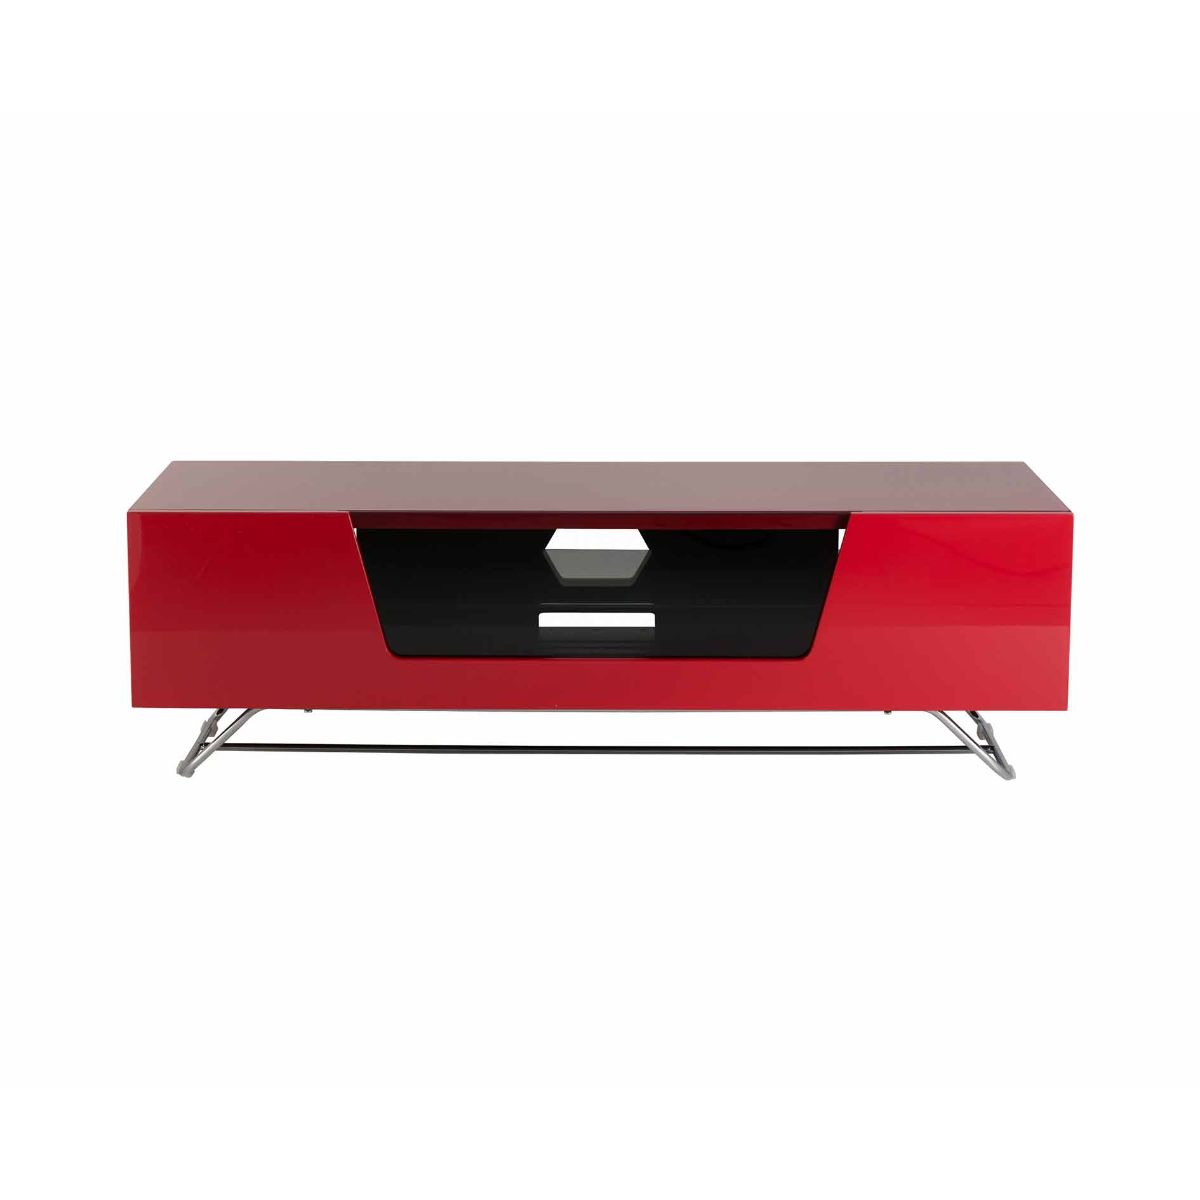 Alphason Chromium 1200 TV Cabinet, Red